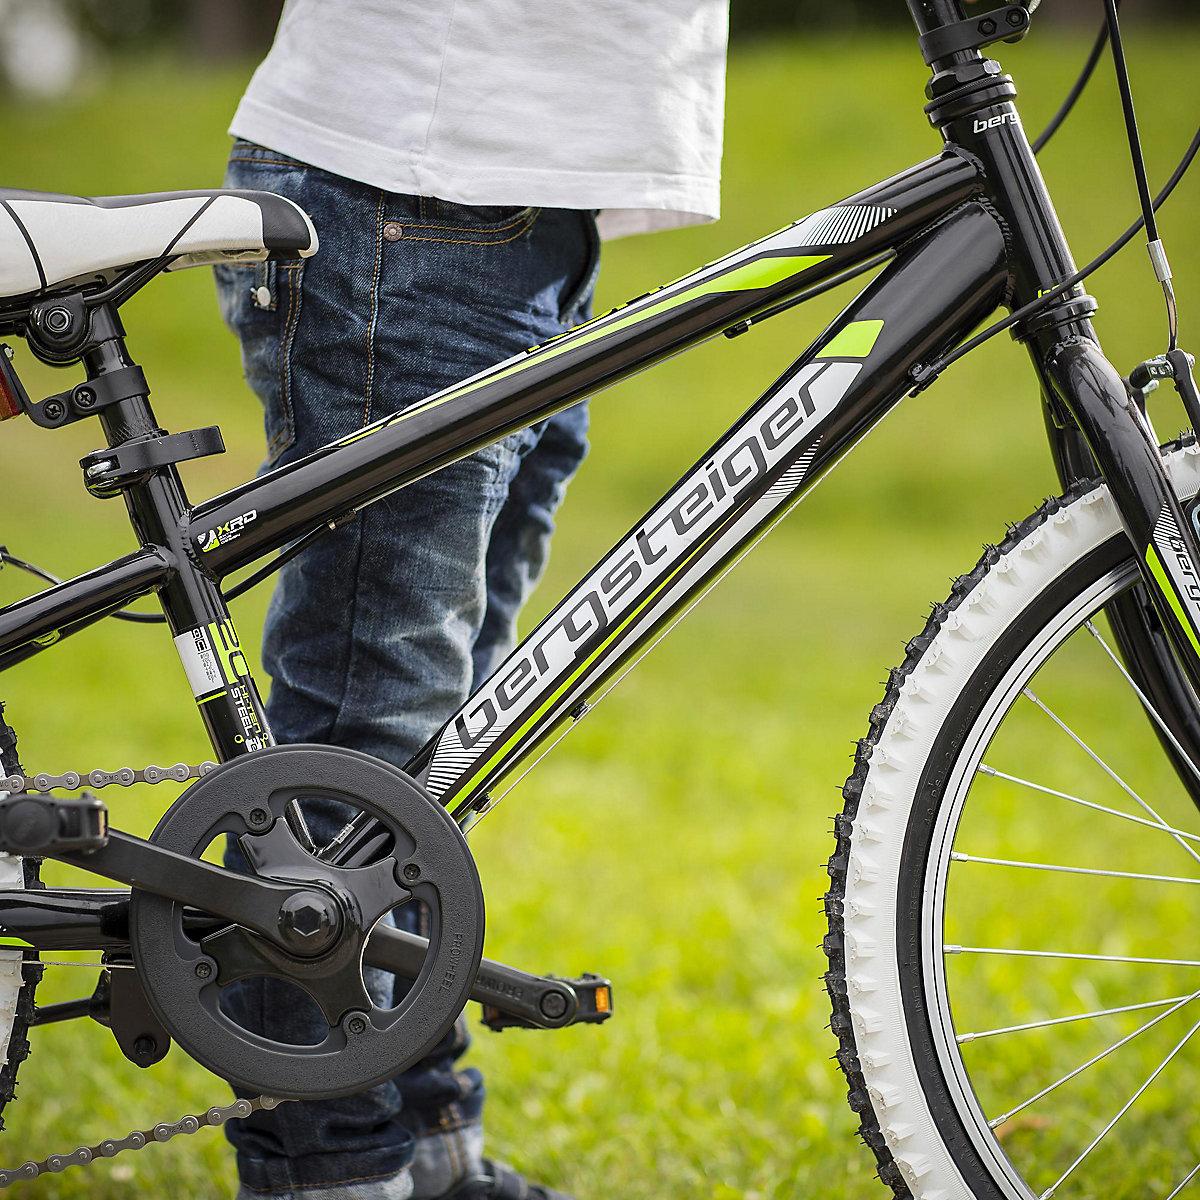 jugendfahrrad mountainbike kansas 20 zoll schwarz. Black Bedroom Furniture Sets. Home Design Ideas